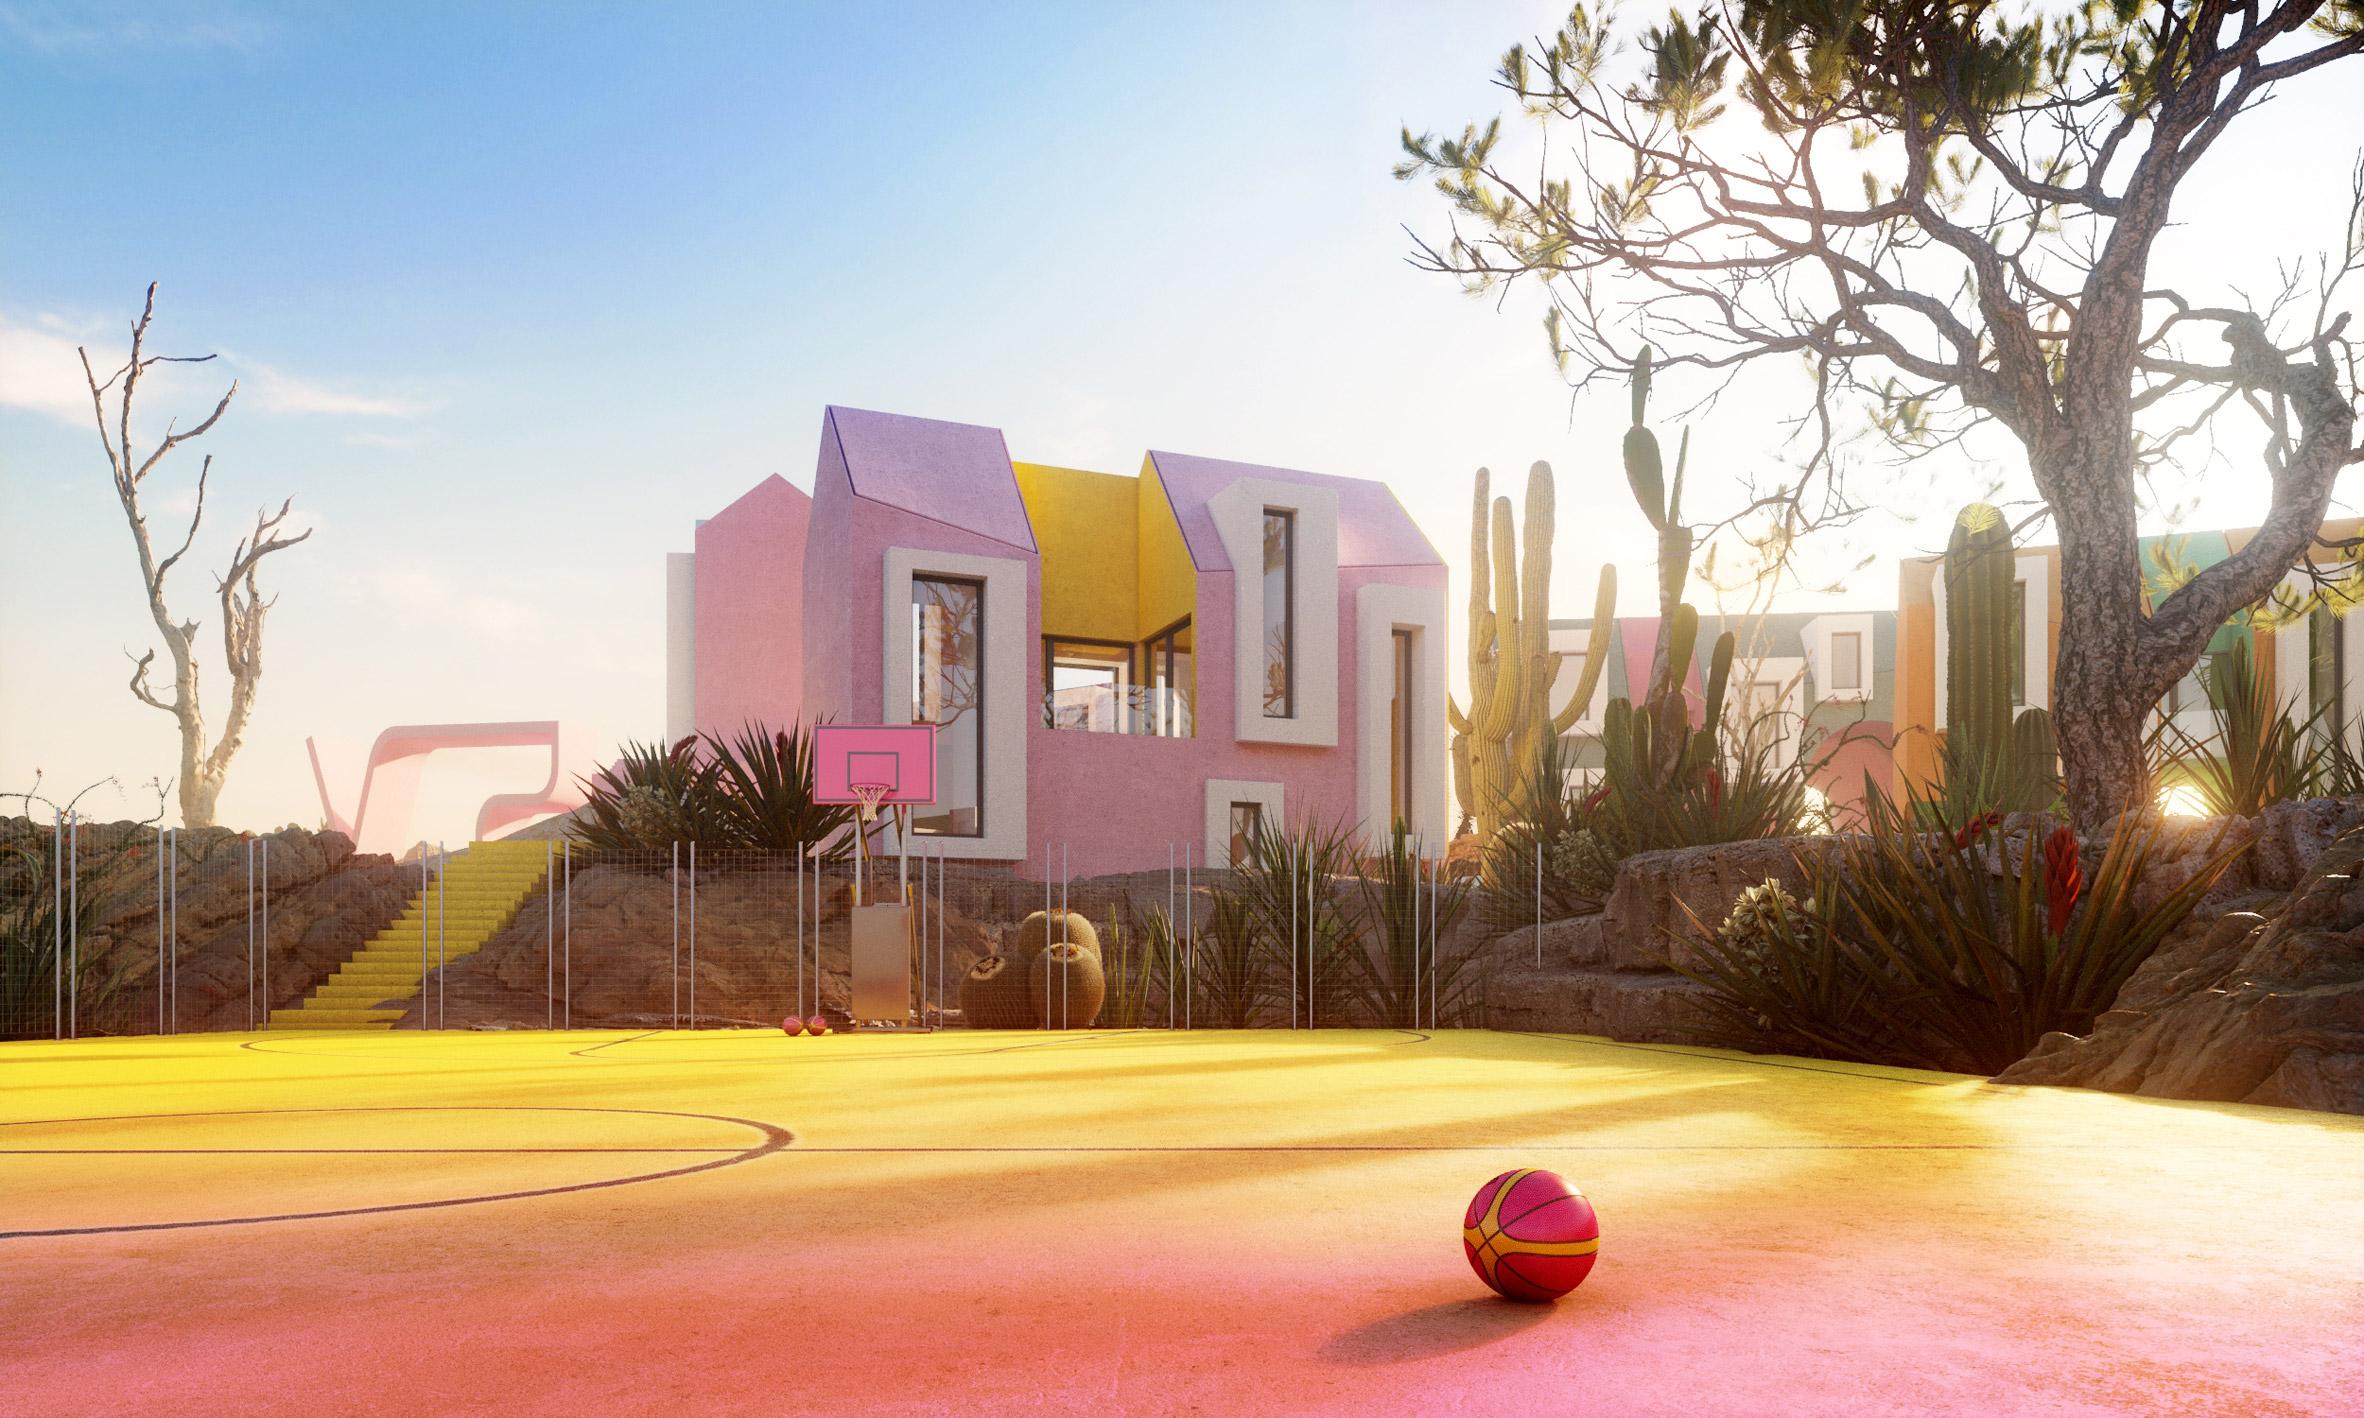 Sonora Art Village by Davit Jilavyan and Mary Jilavyan